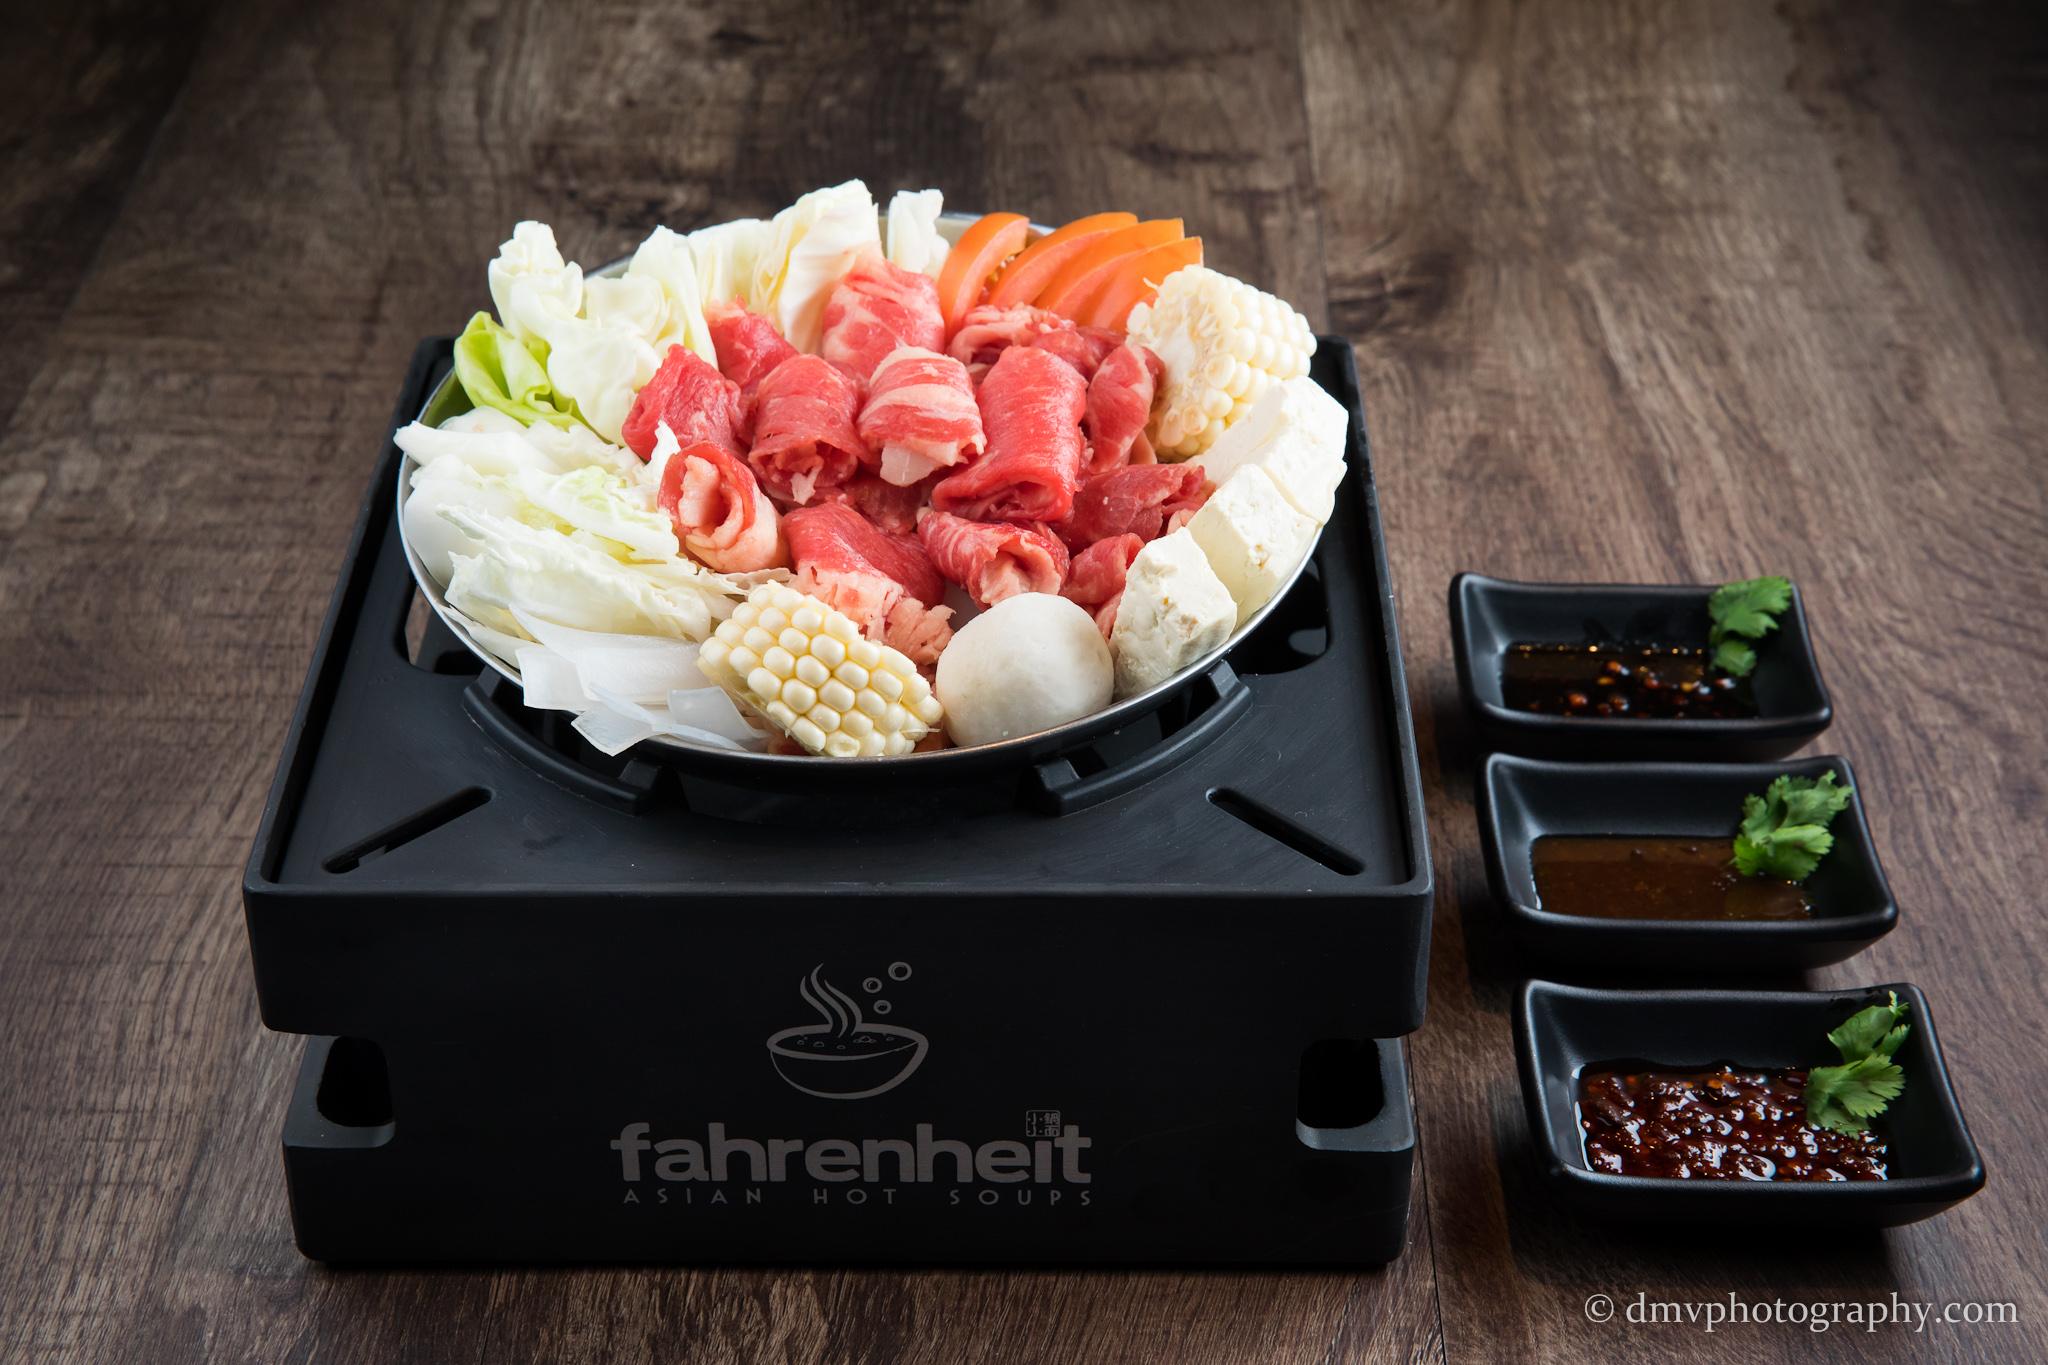 2016-11-20 - Fahrenheit Asian Hot Soups - 00013